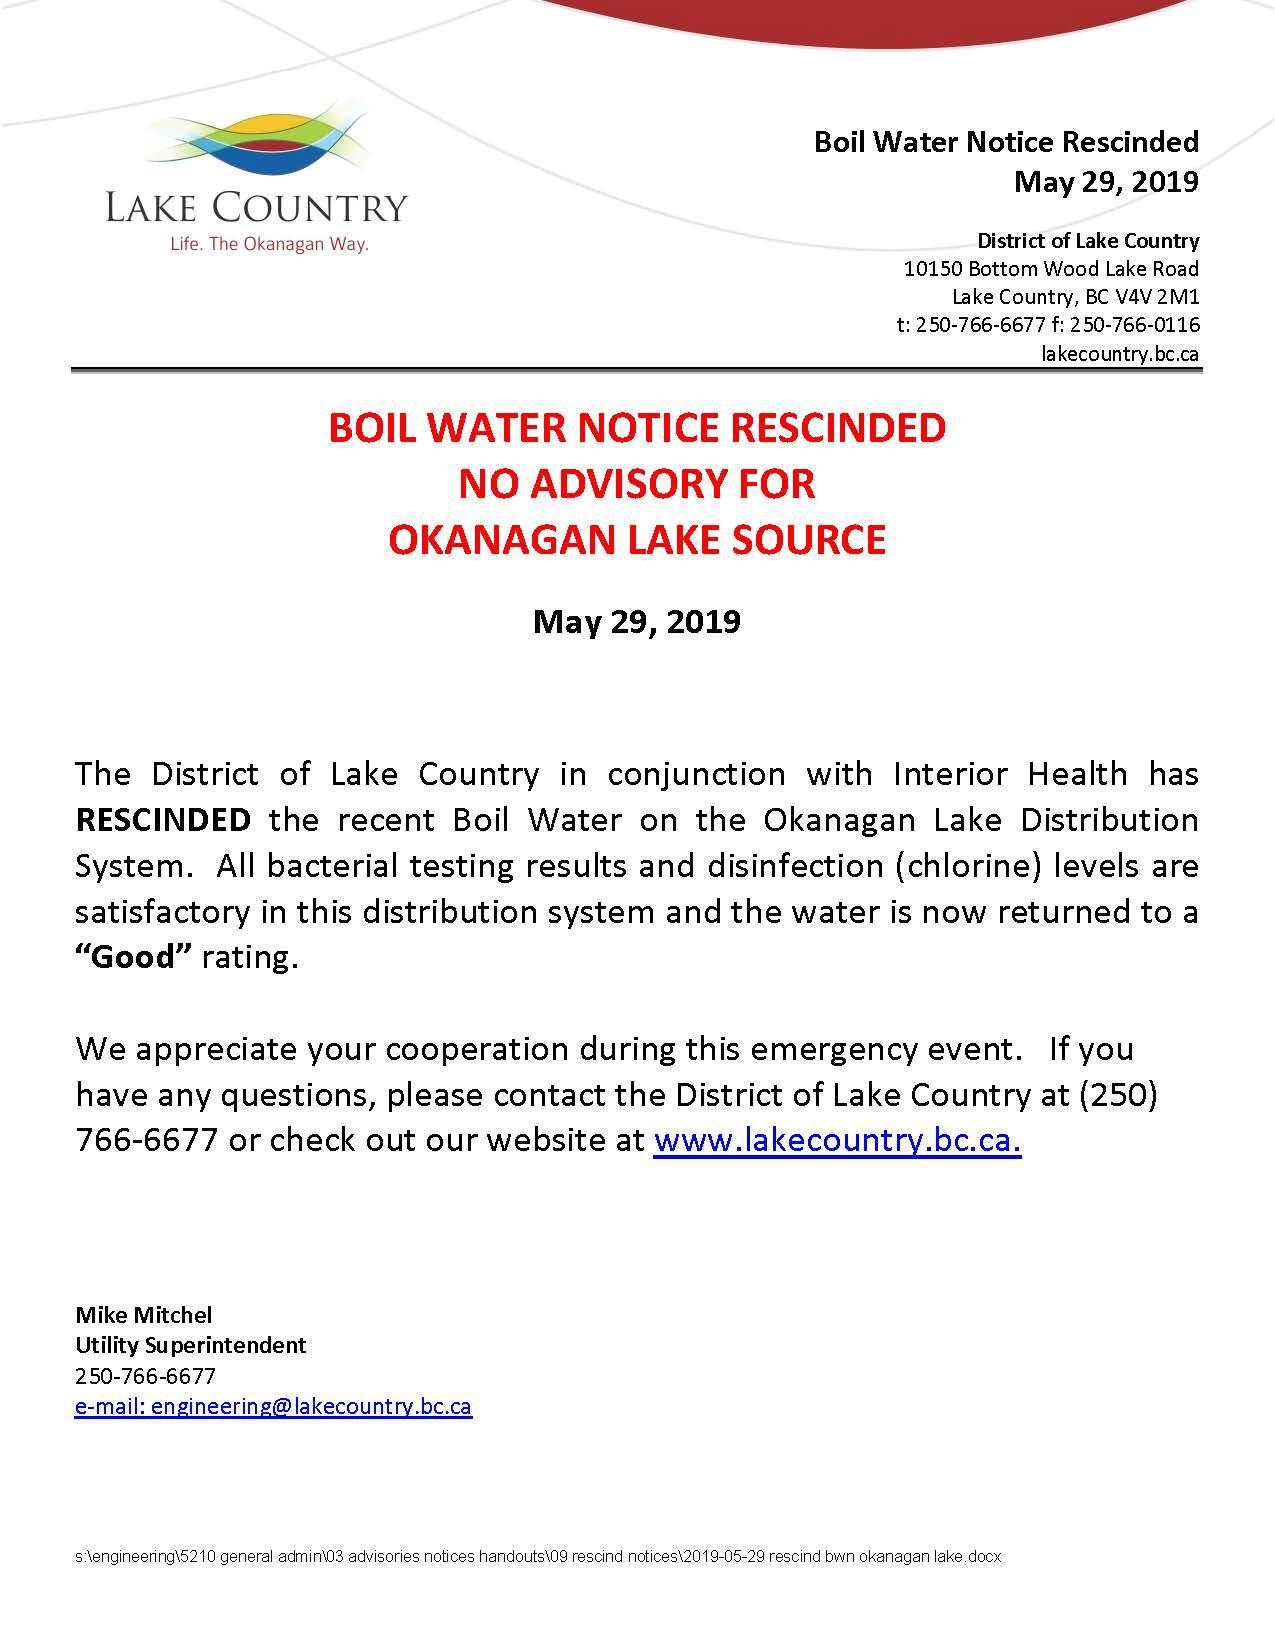 2019-05-29 Rescind BWN Okanagan Lake